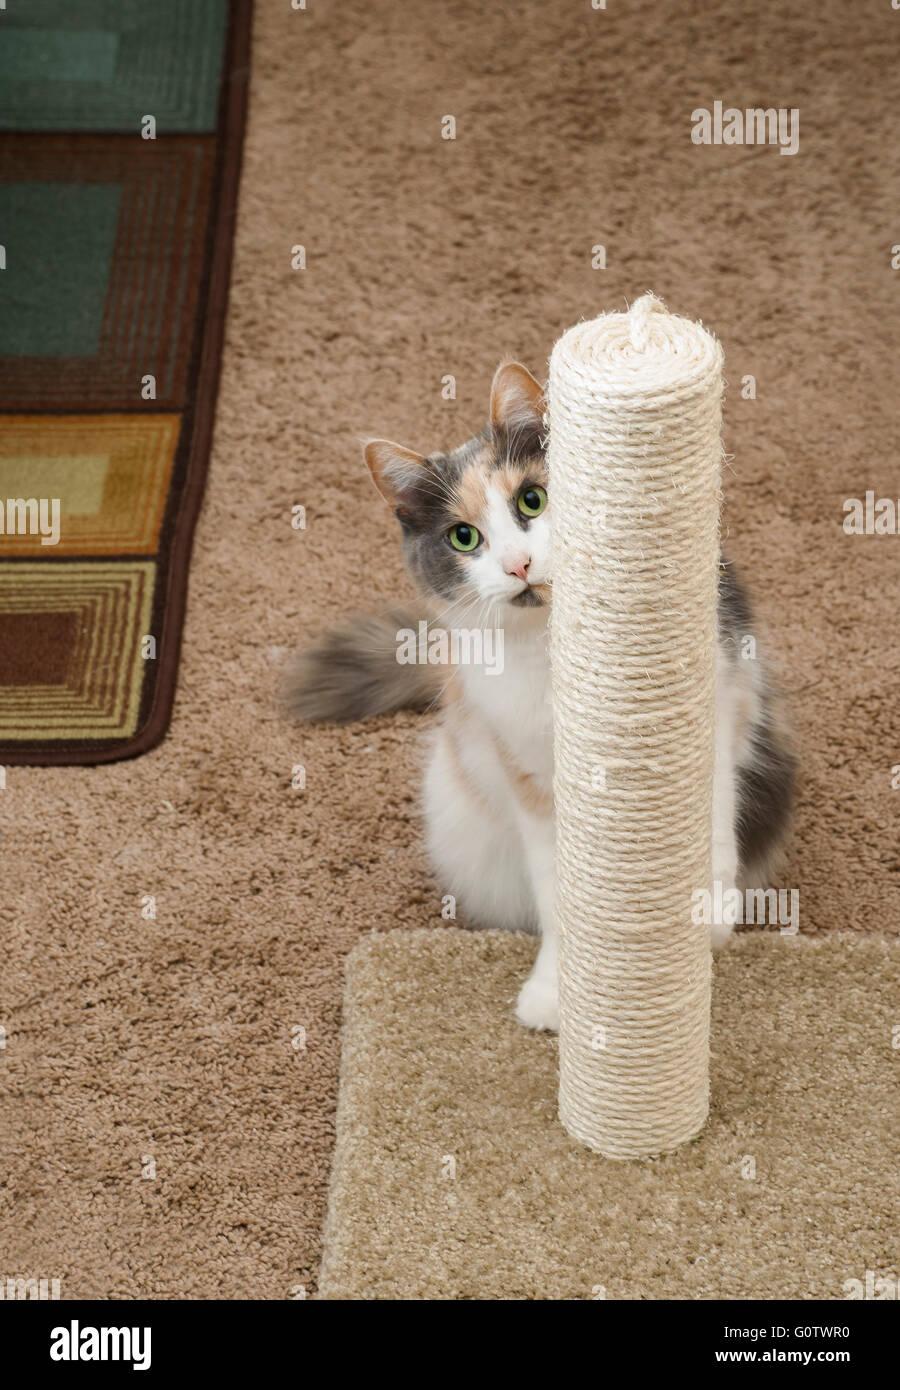 An adult domesticated cat peeking around a scratching post. - Stock Image